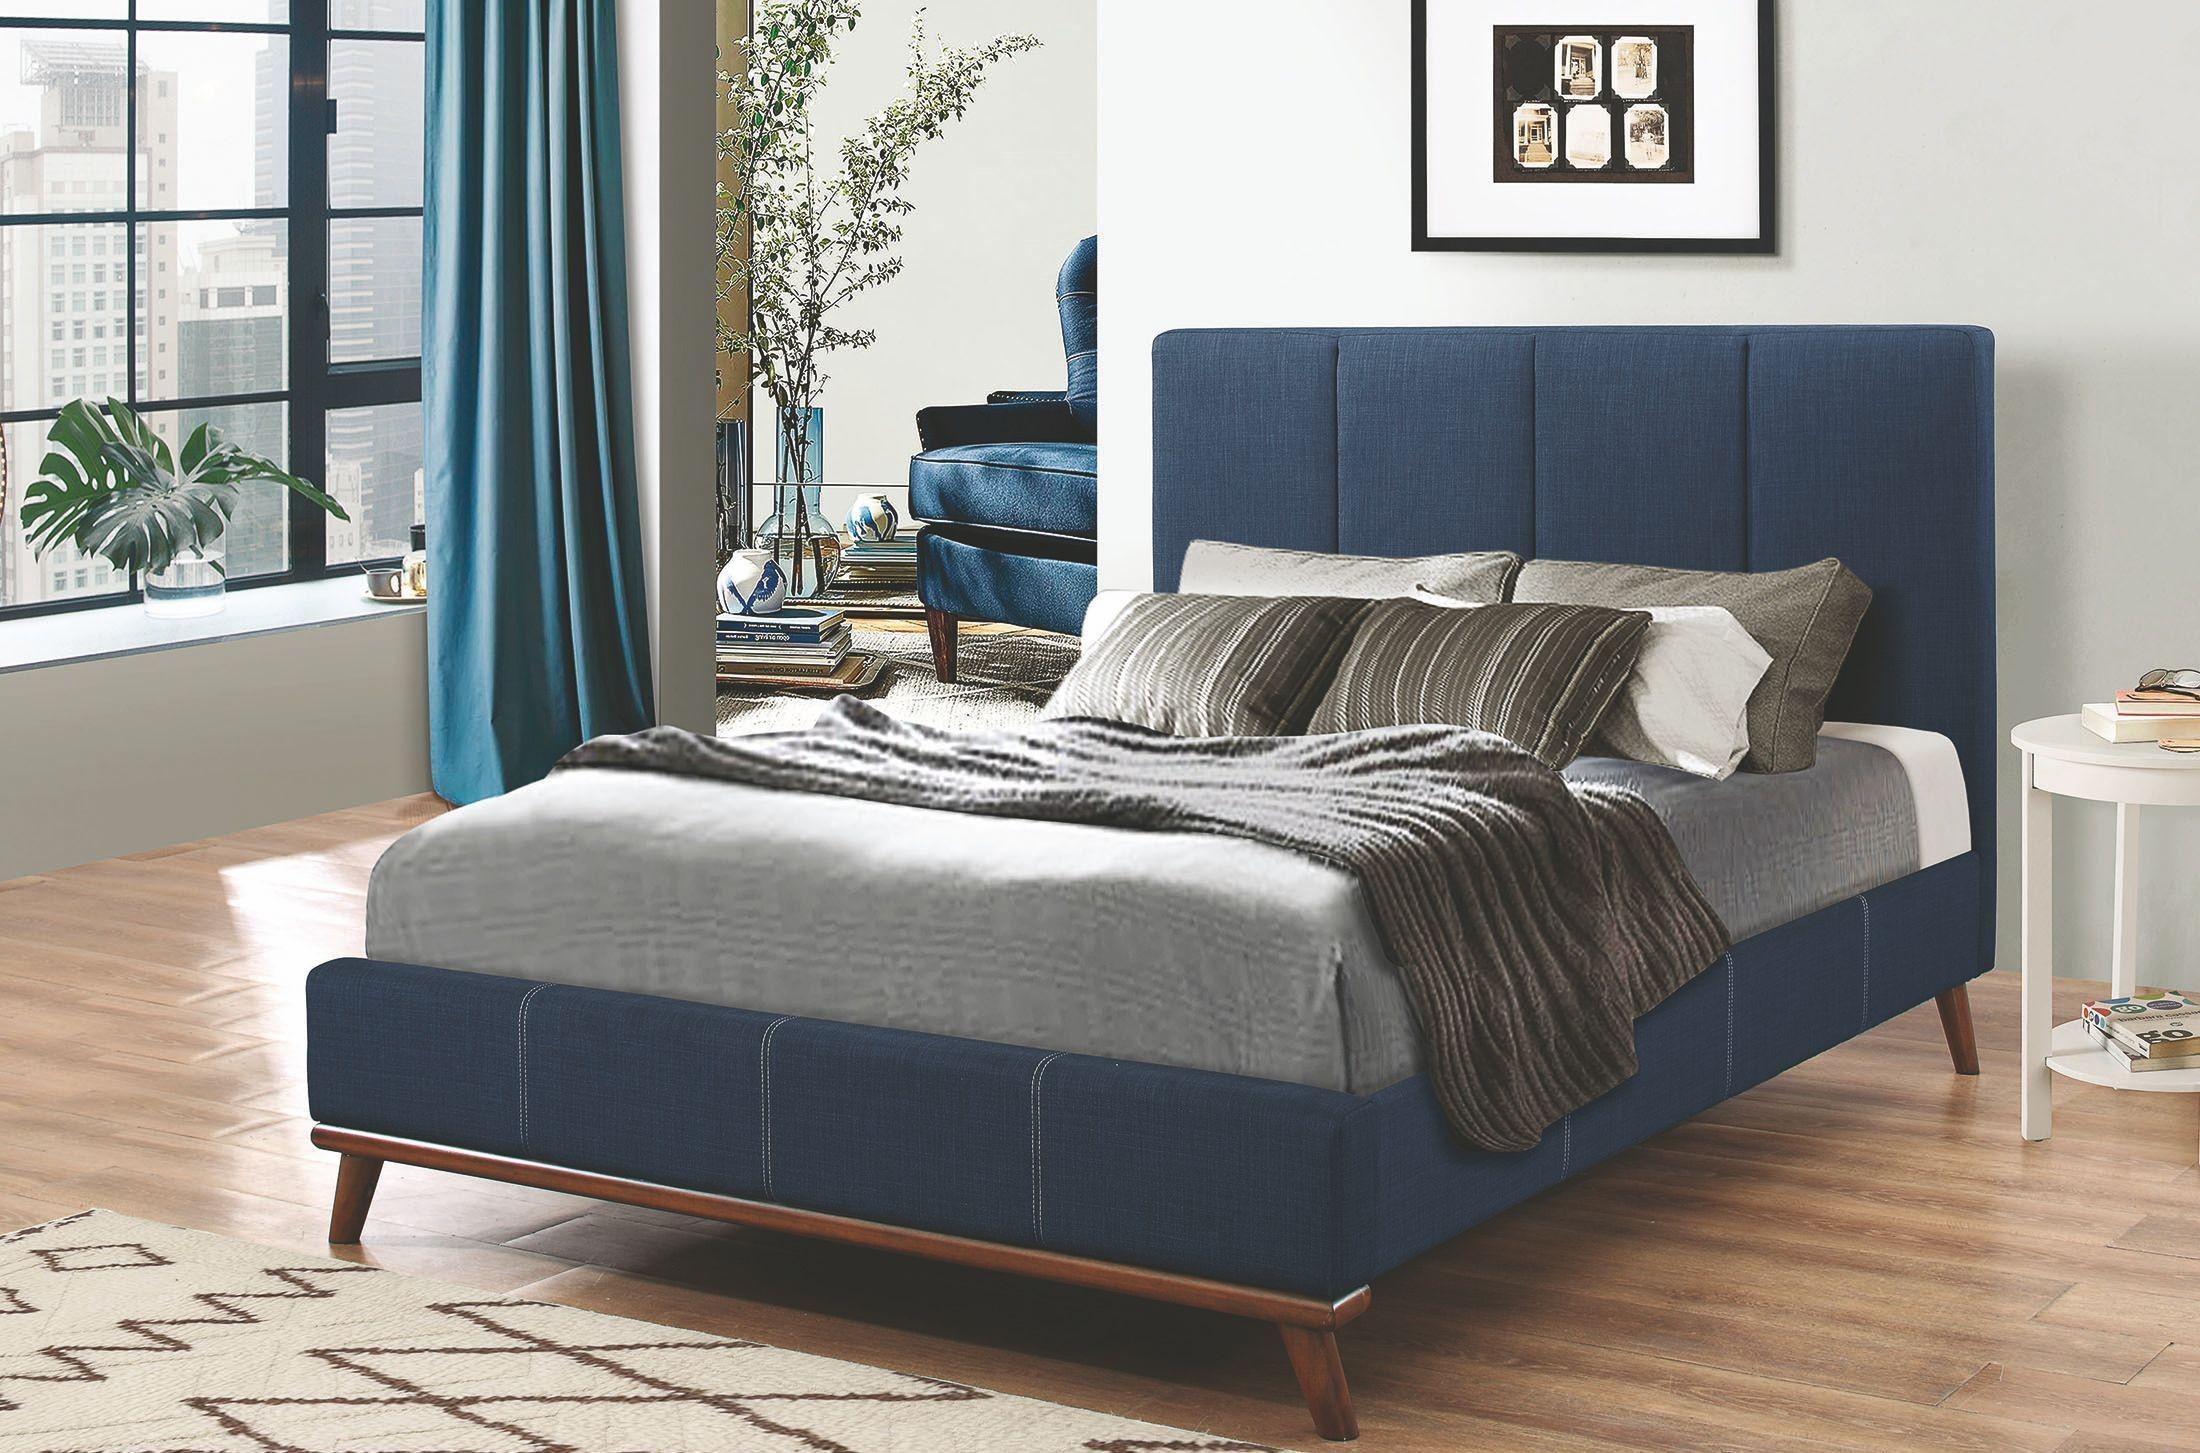 Charity Dark Blue King Upholstered Platform Bed From